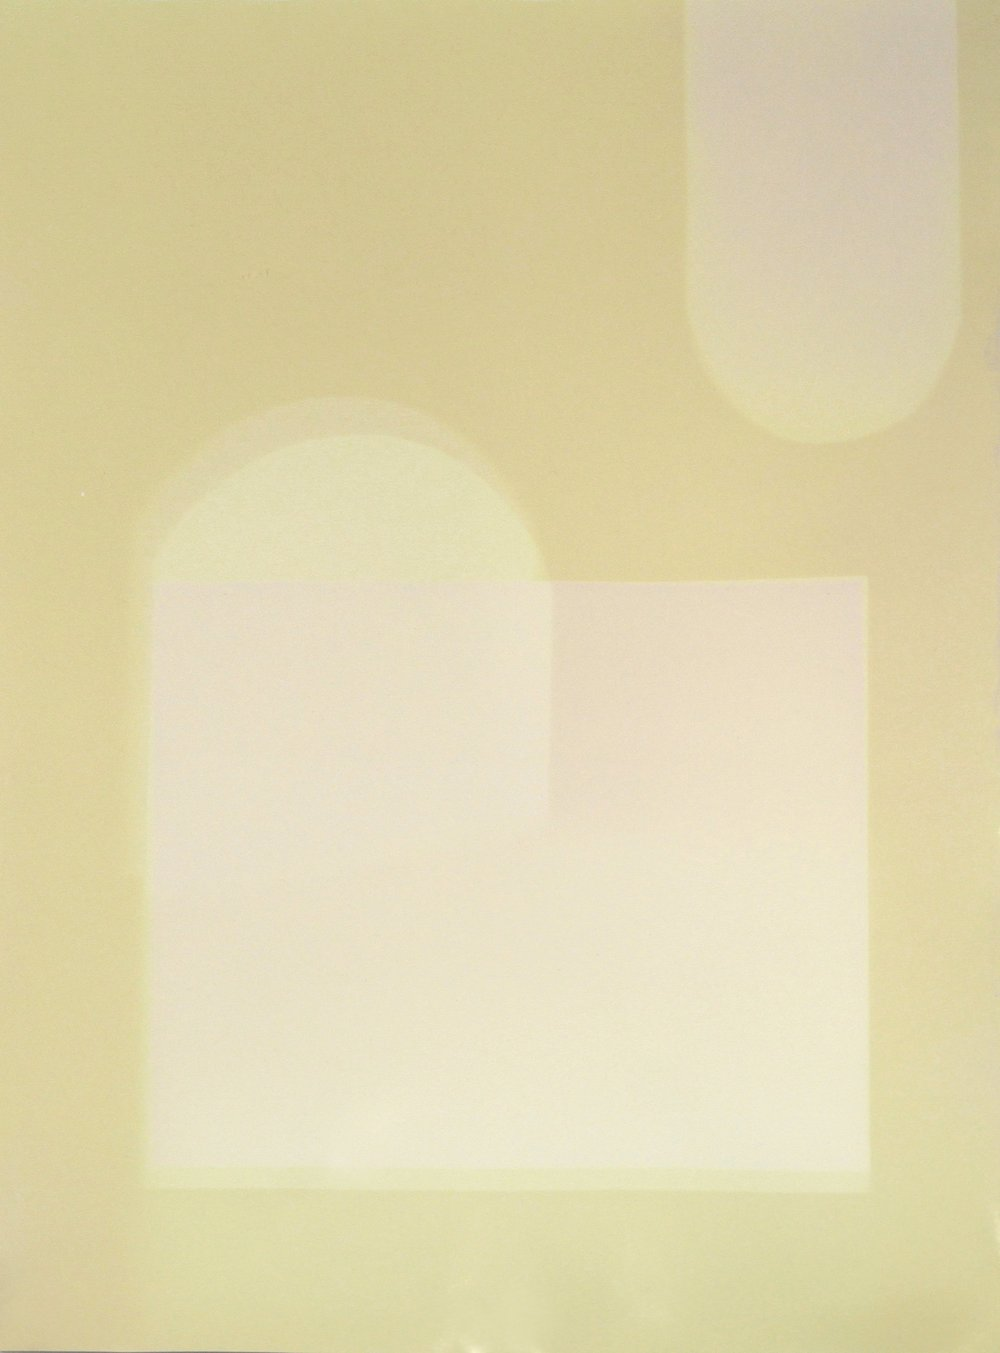 rachelle-bussieries-2500w0006.jpg